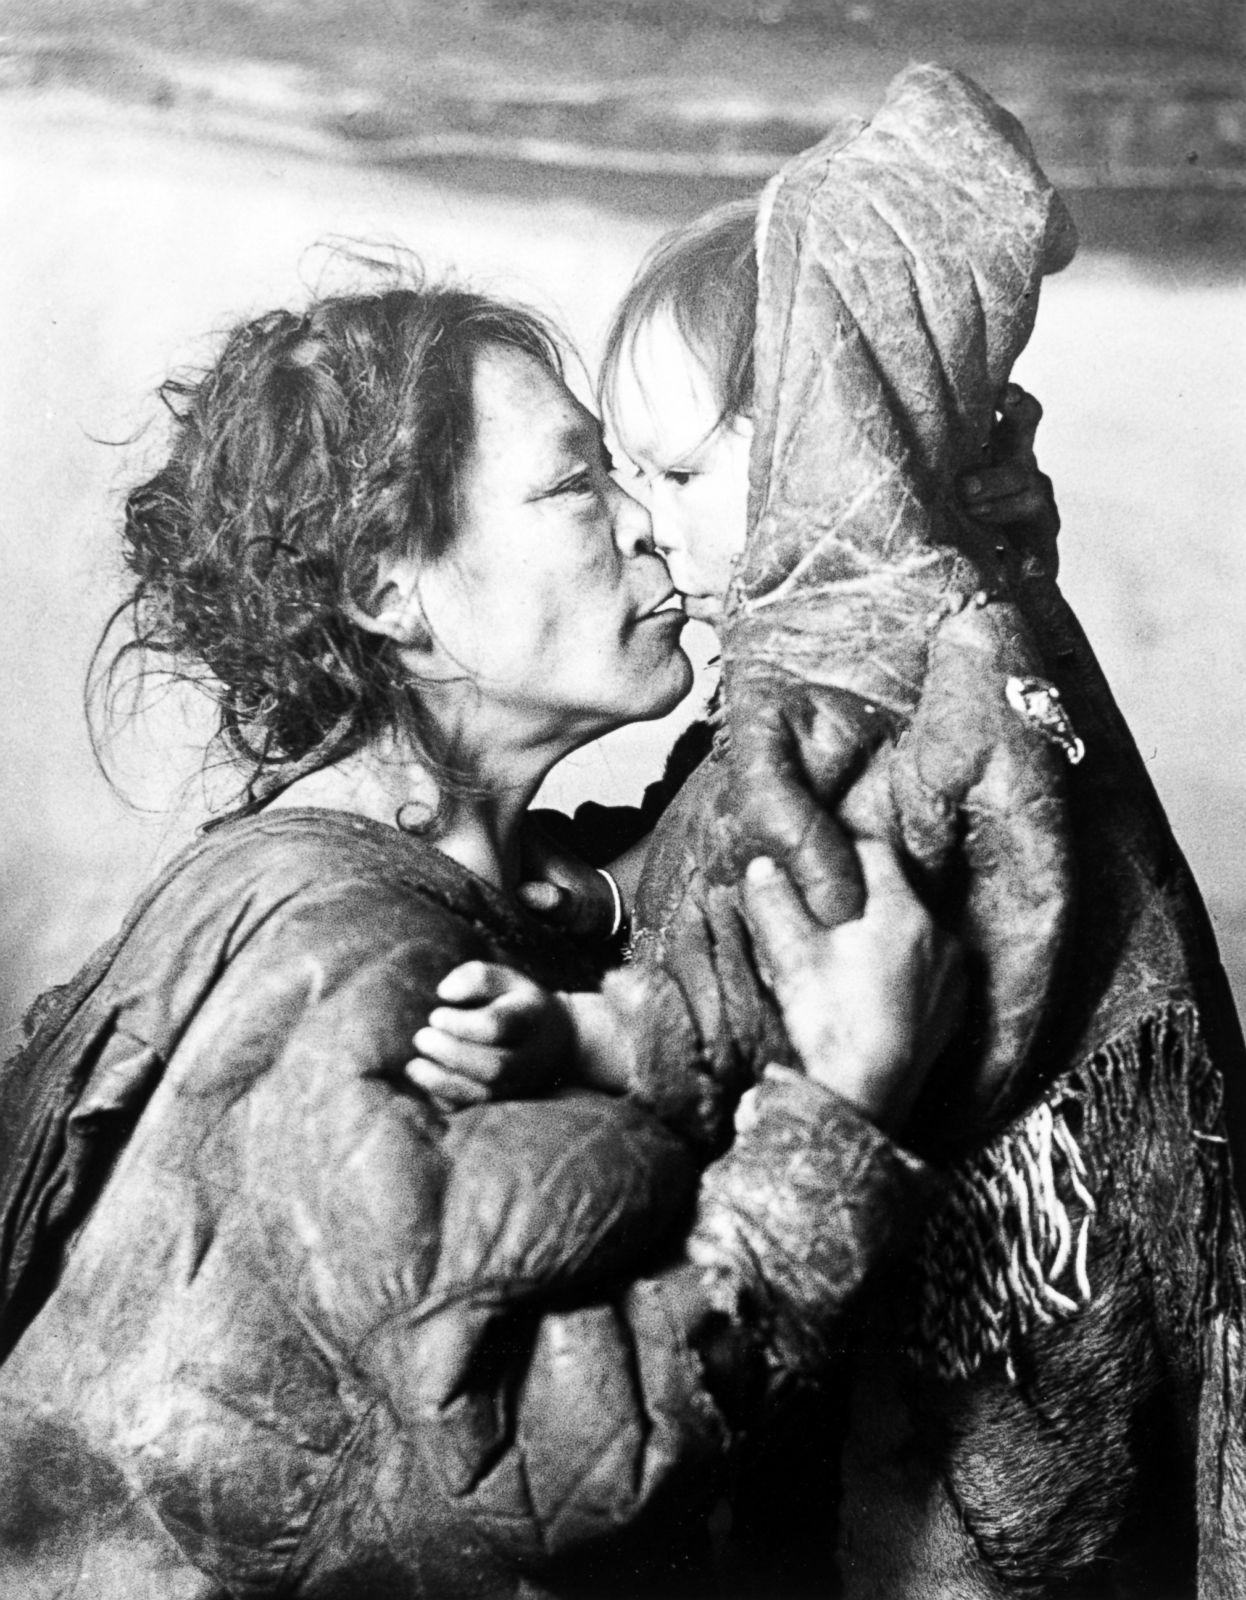 Madre Inuit hace mimos a su hijo